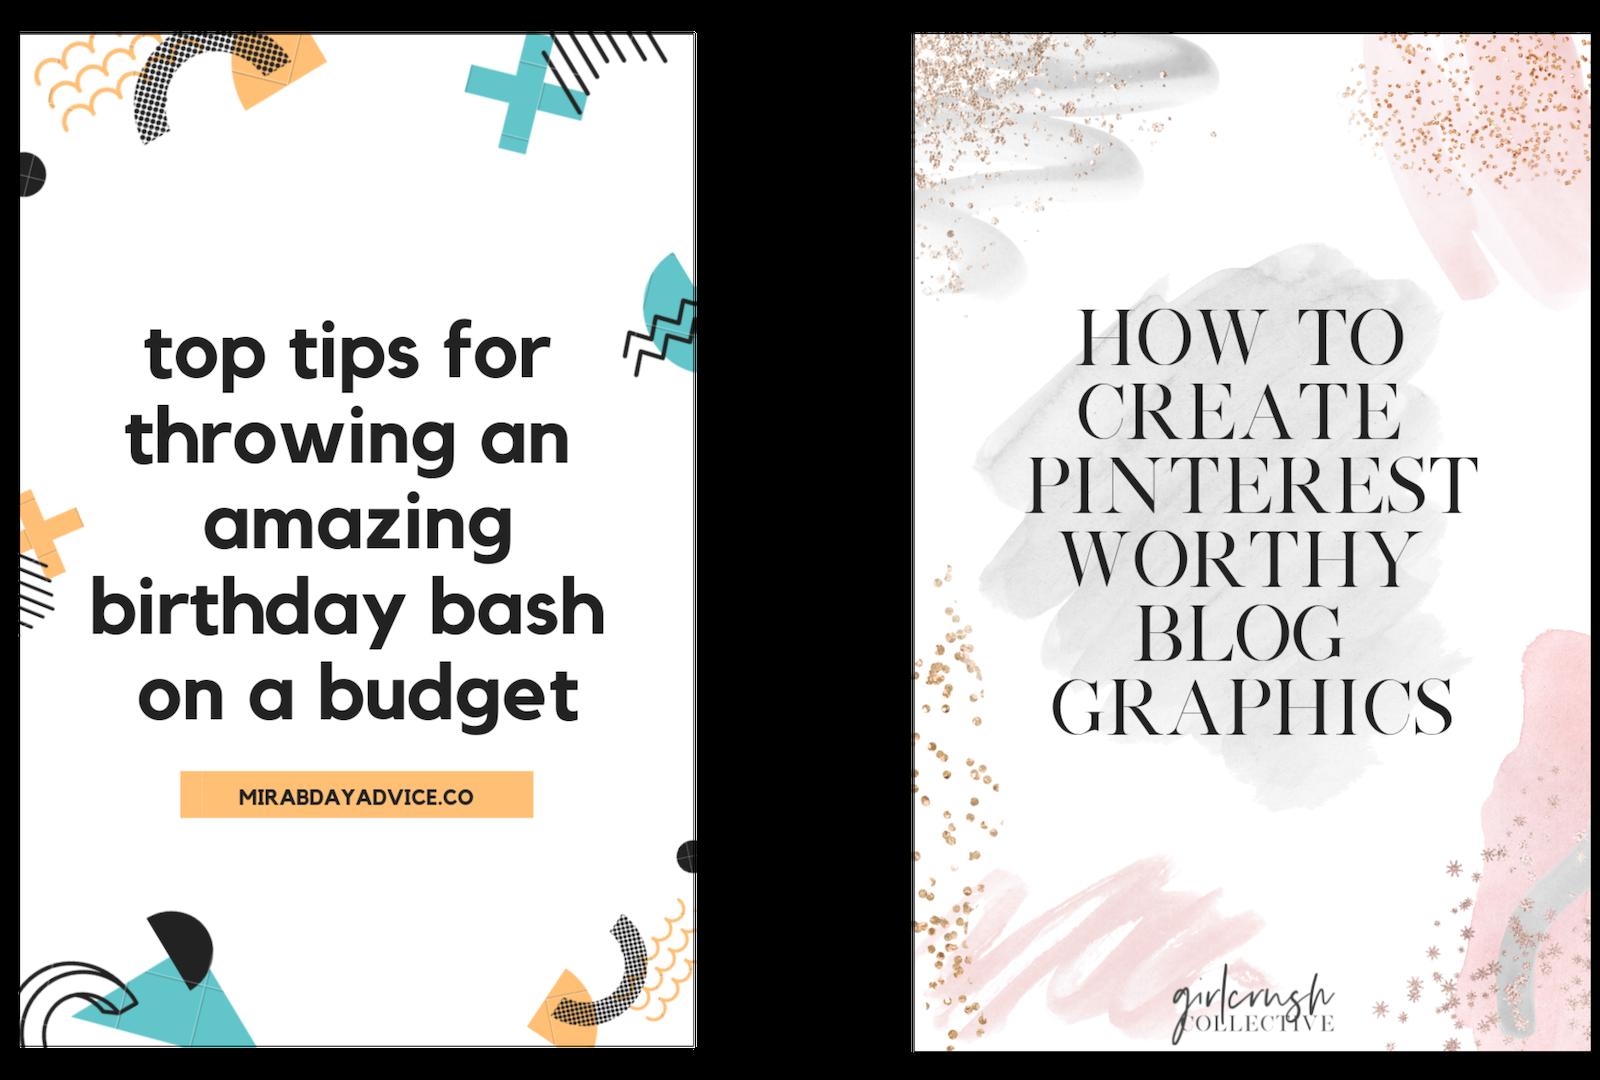 canva tutorial for pinterest blog graphics